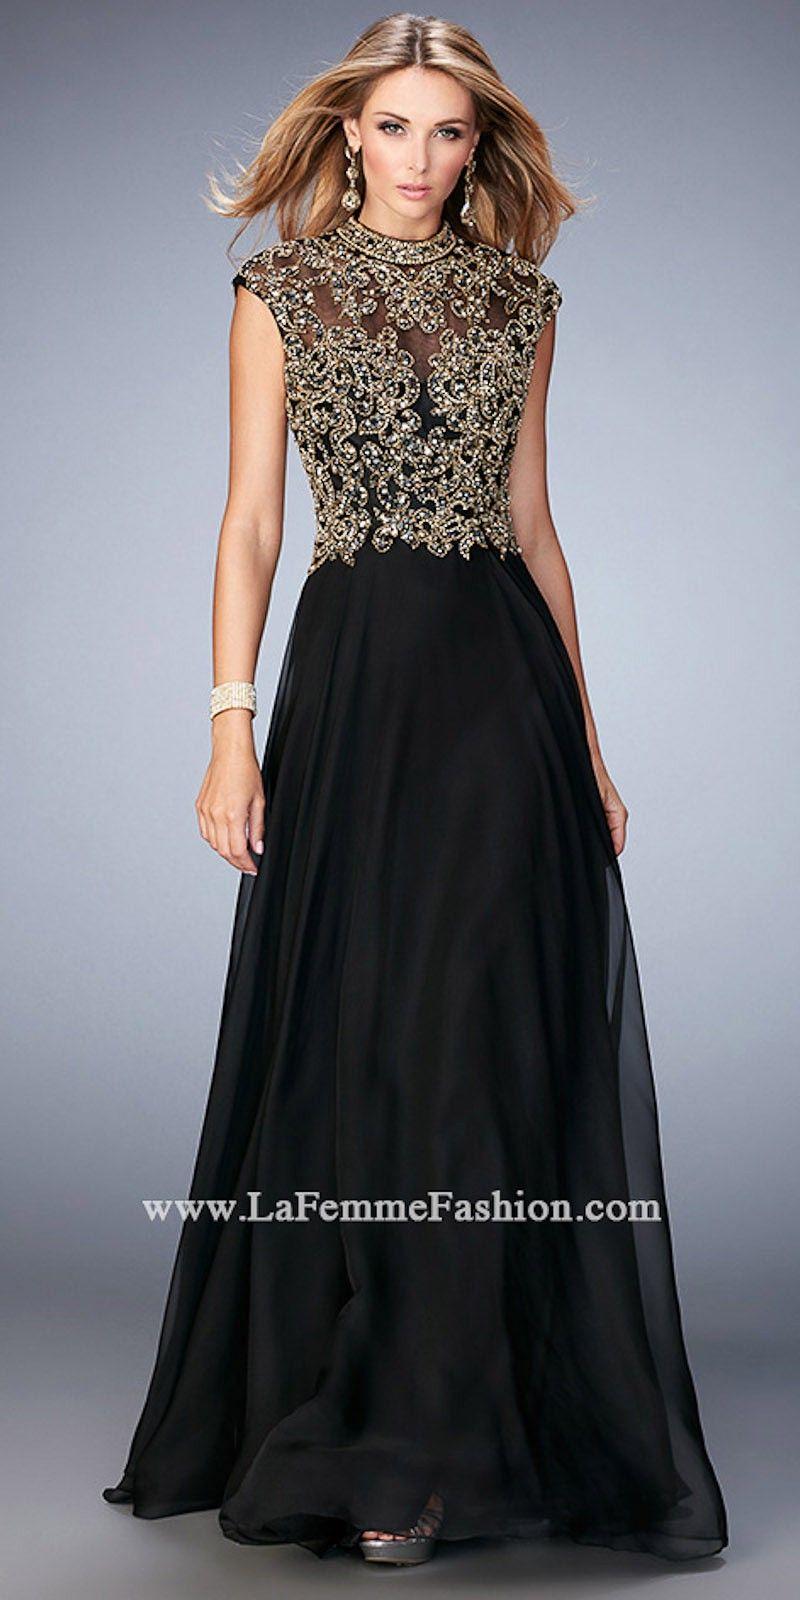 4104e3a3962 Embellished Mock Neck Prom Dress by La Femme